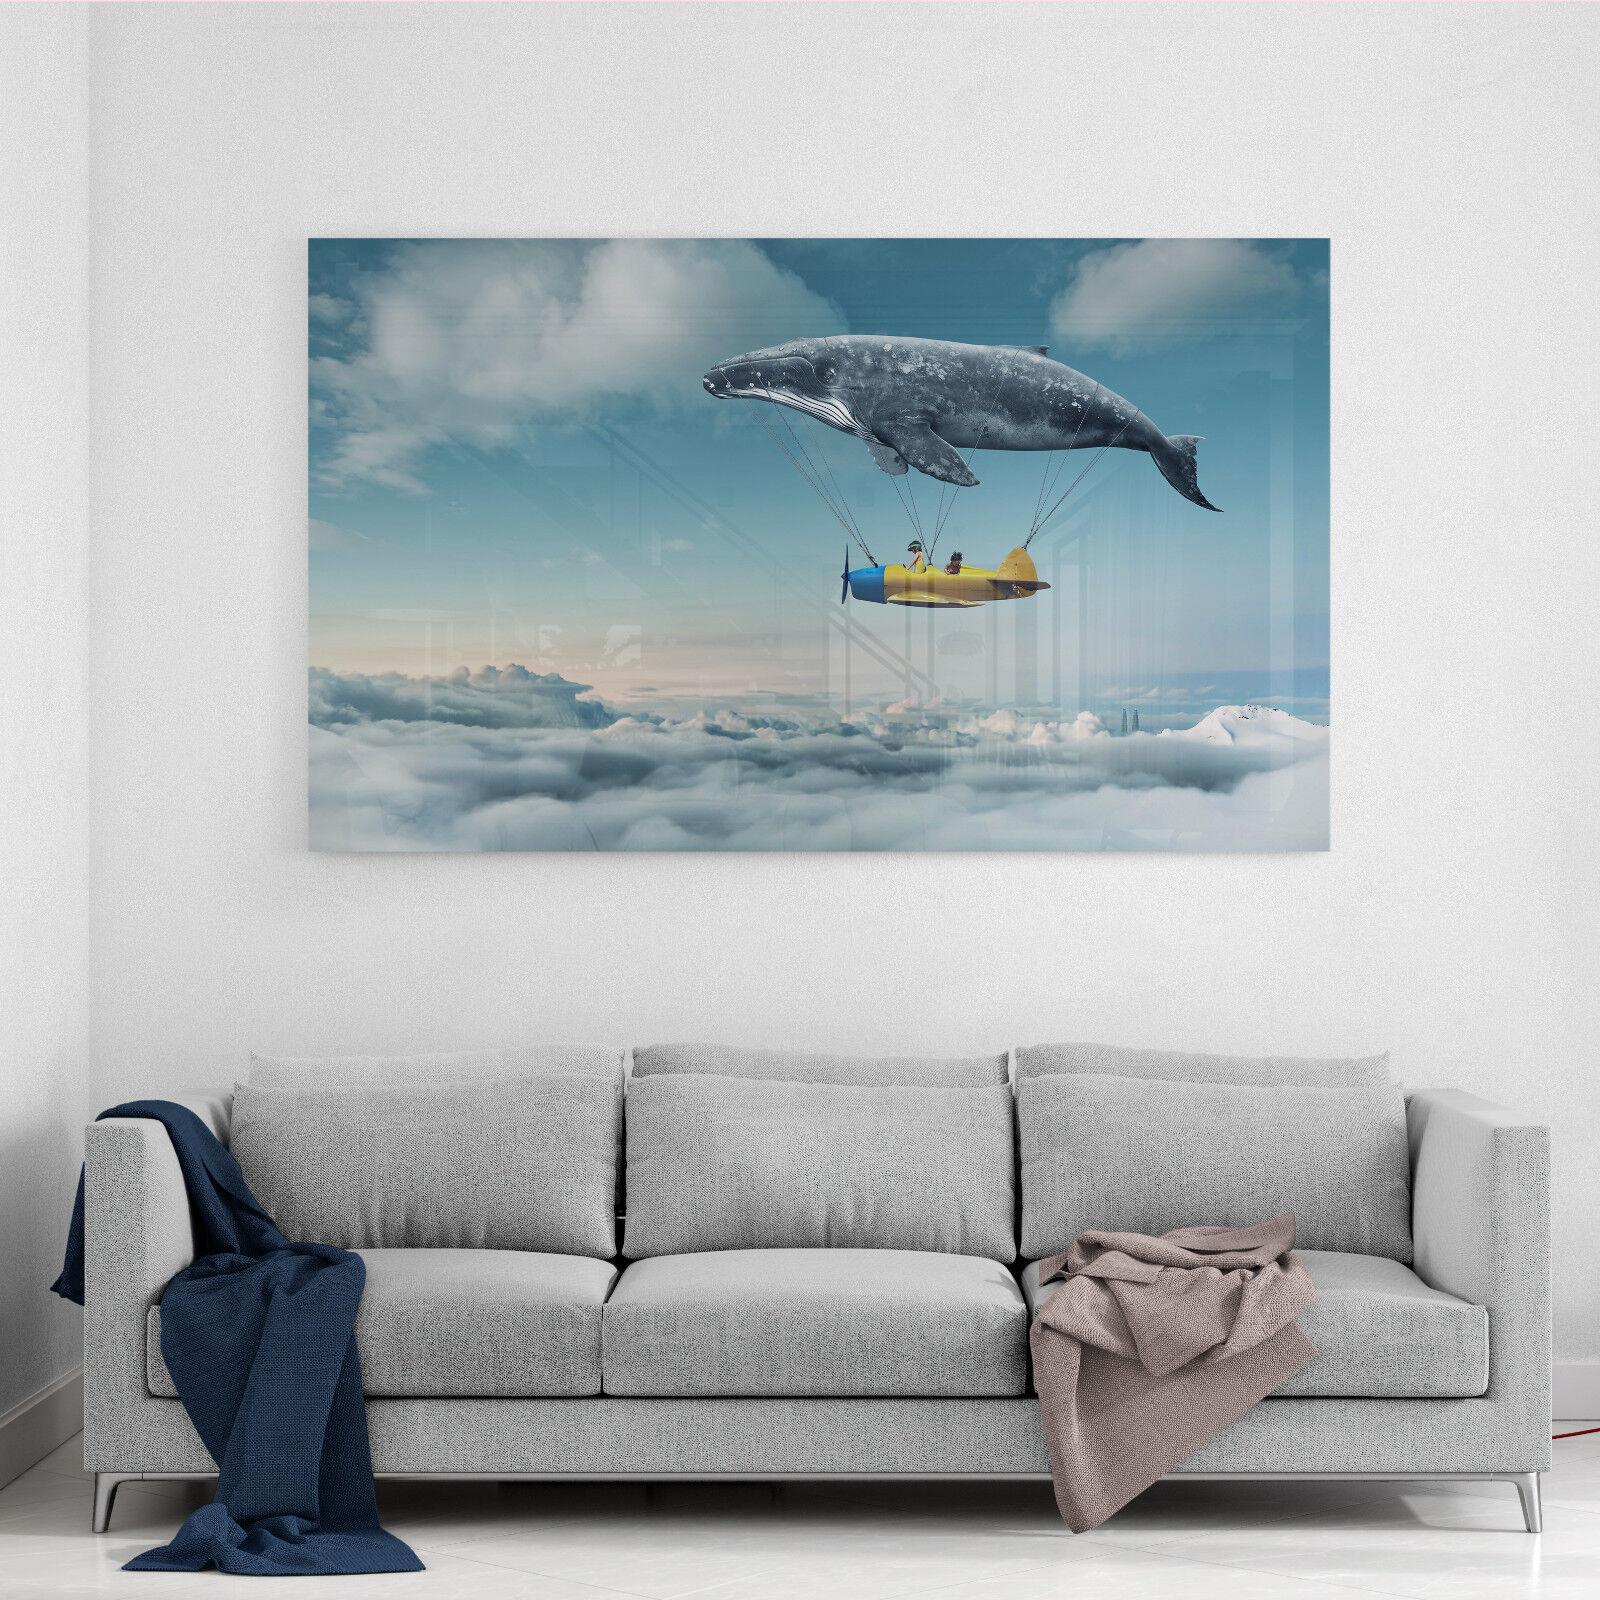 Trempé ESG Art verre Imprimé Photo Wall Art ESG Hang Photo conte de fées Prizma GWA0345 061730